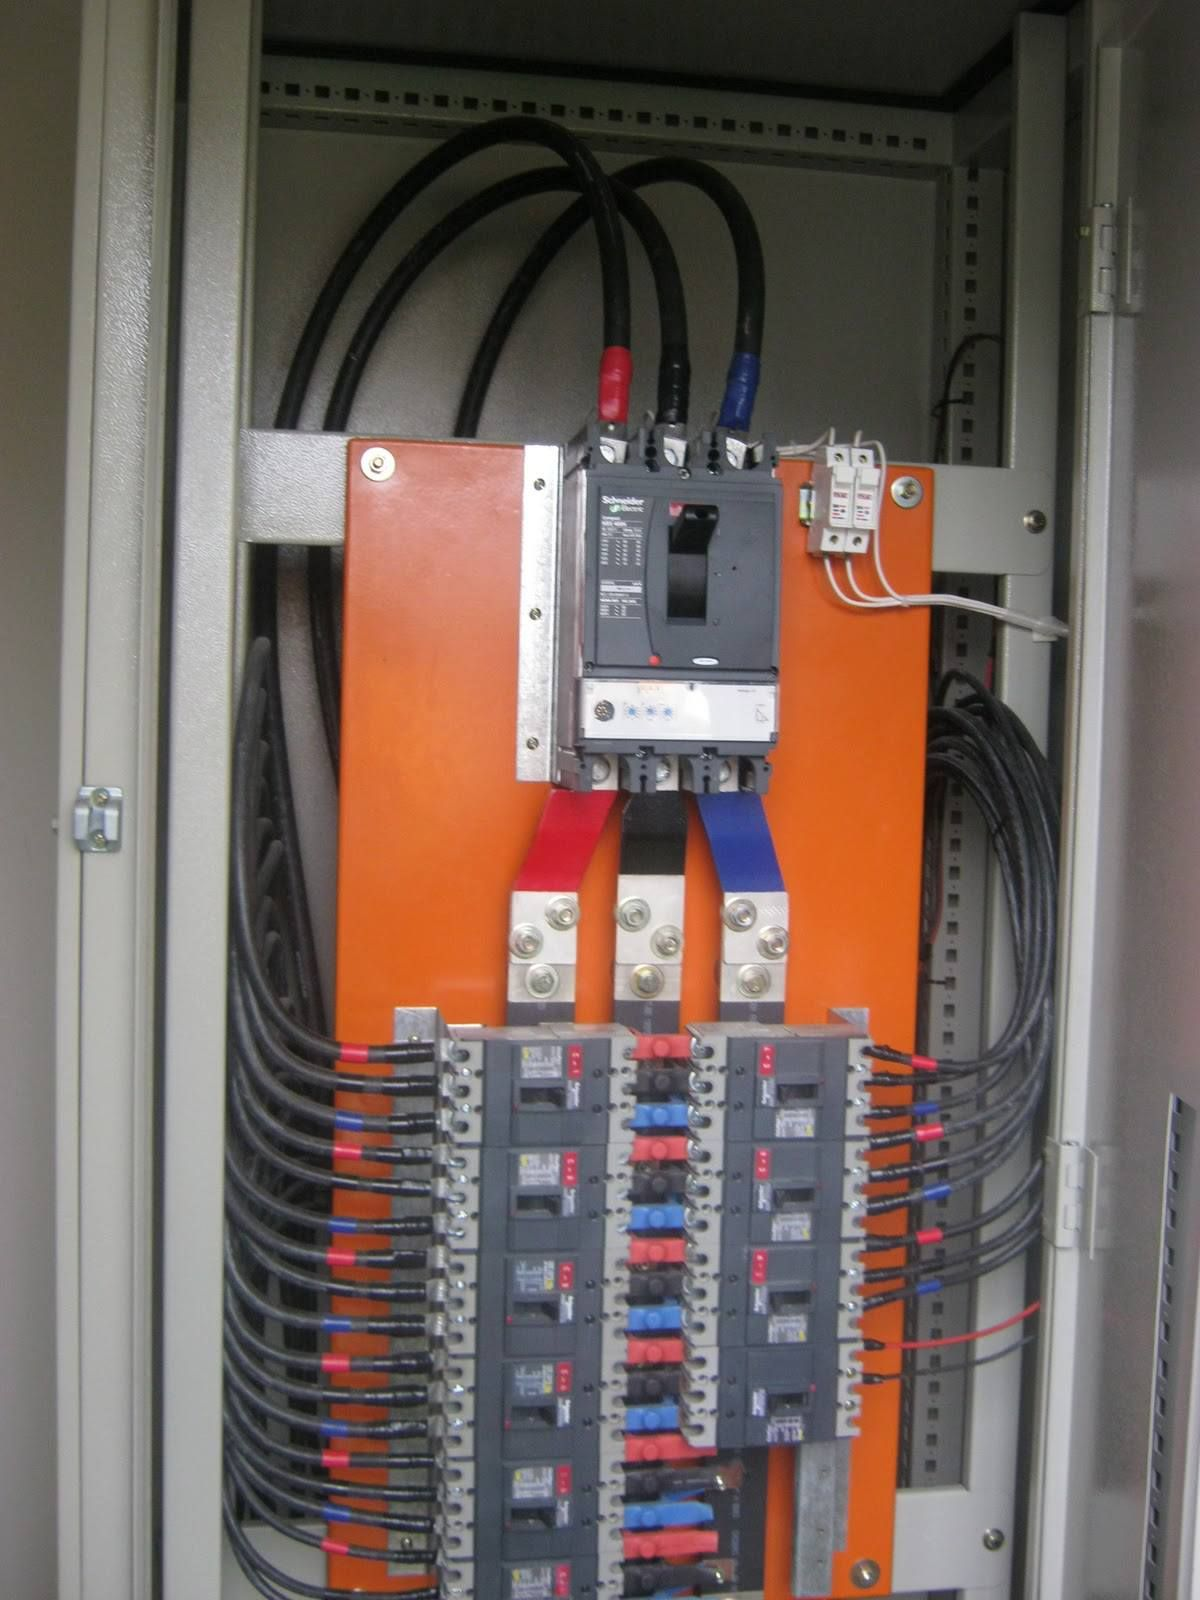 medium resolution of electrical symbols electrical wiring electronic engineering electrical engineering technology board calculator tech sign